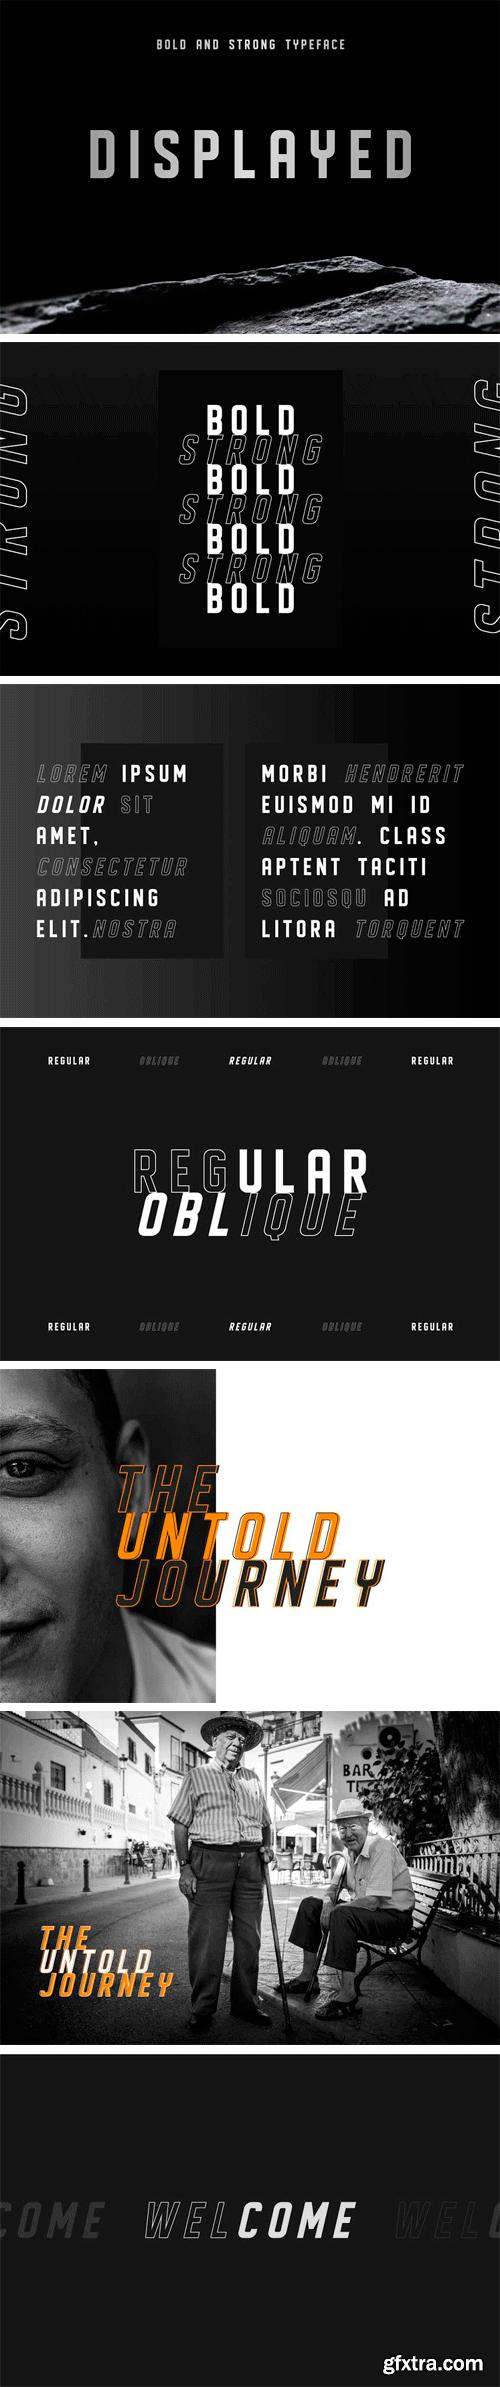 CM - DISPLAYED Typeface 2938701